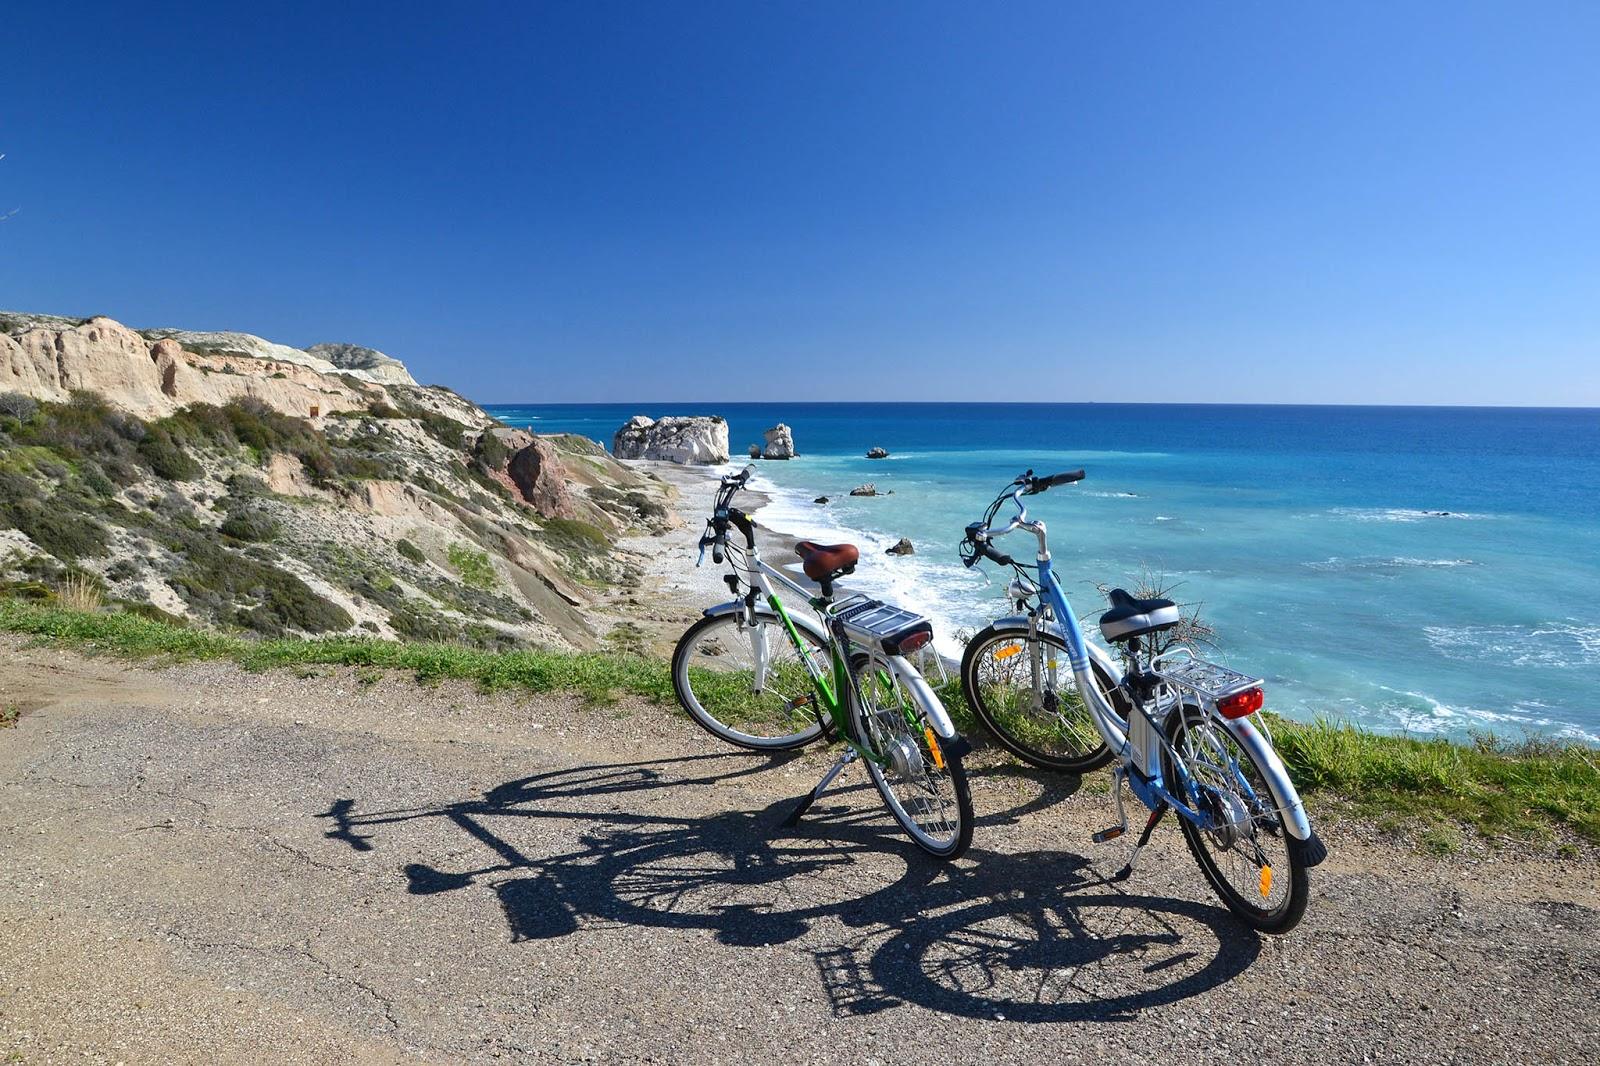 Прокат велосипедов на Кипре